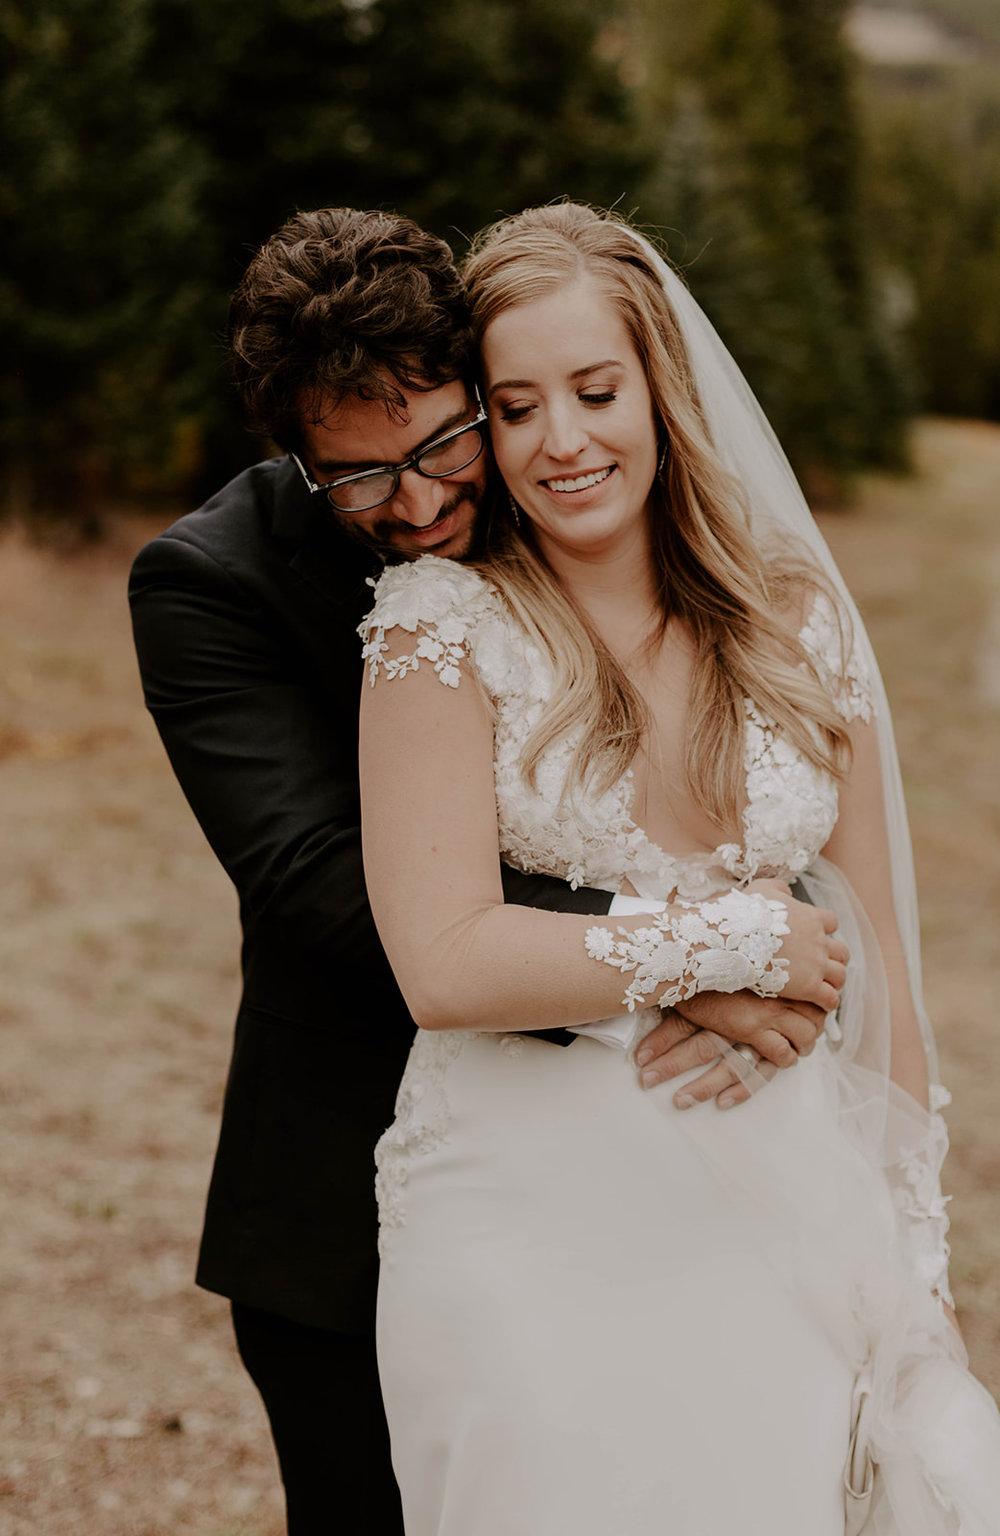 karra leigh photography- jenny and julio wedding808.jpg